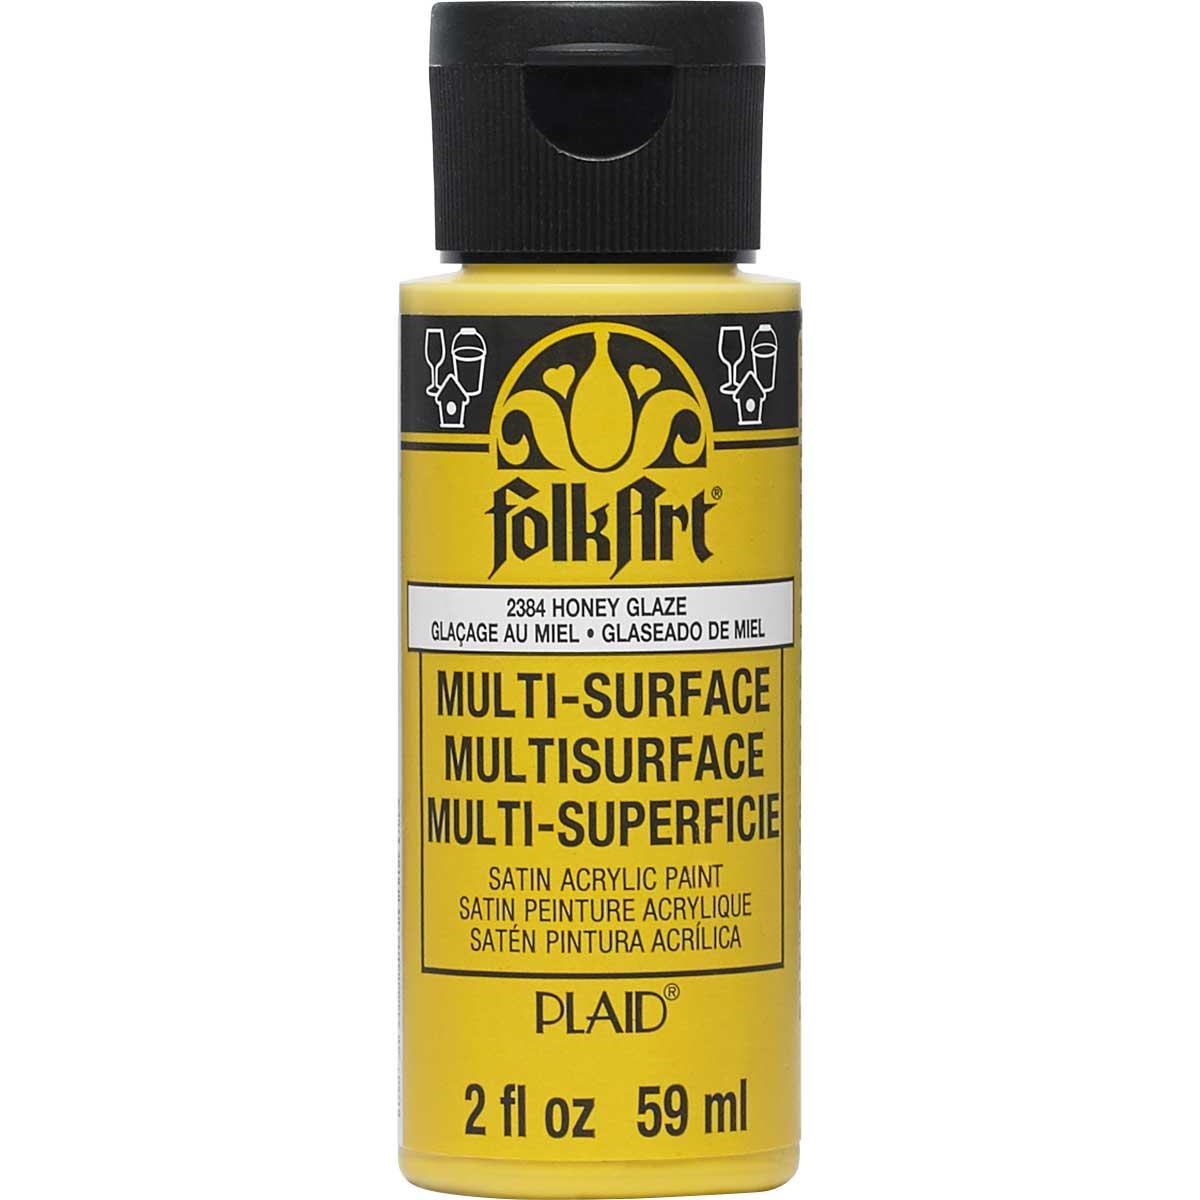 FolkArt ® Multi-Surface Satin Acrylic Paints - Honey Glaze, 2 oz. - 2384